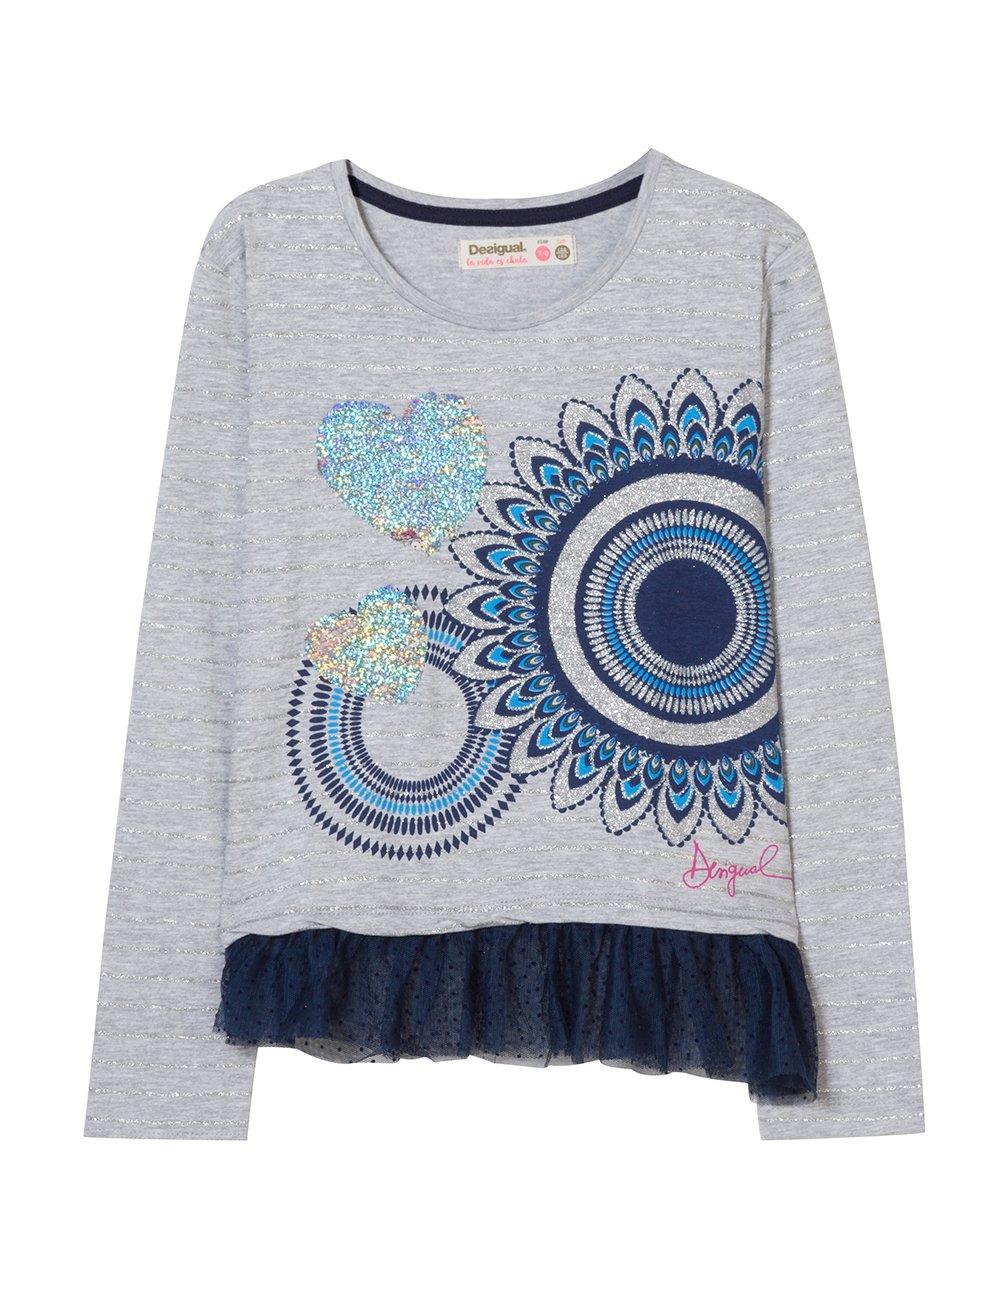 Desigual TS_dolichothele Camiseta para Niñas